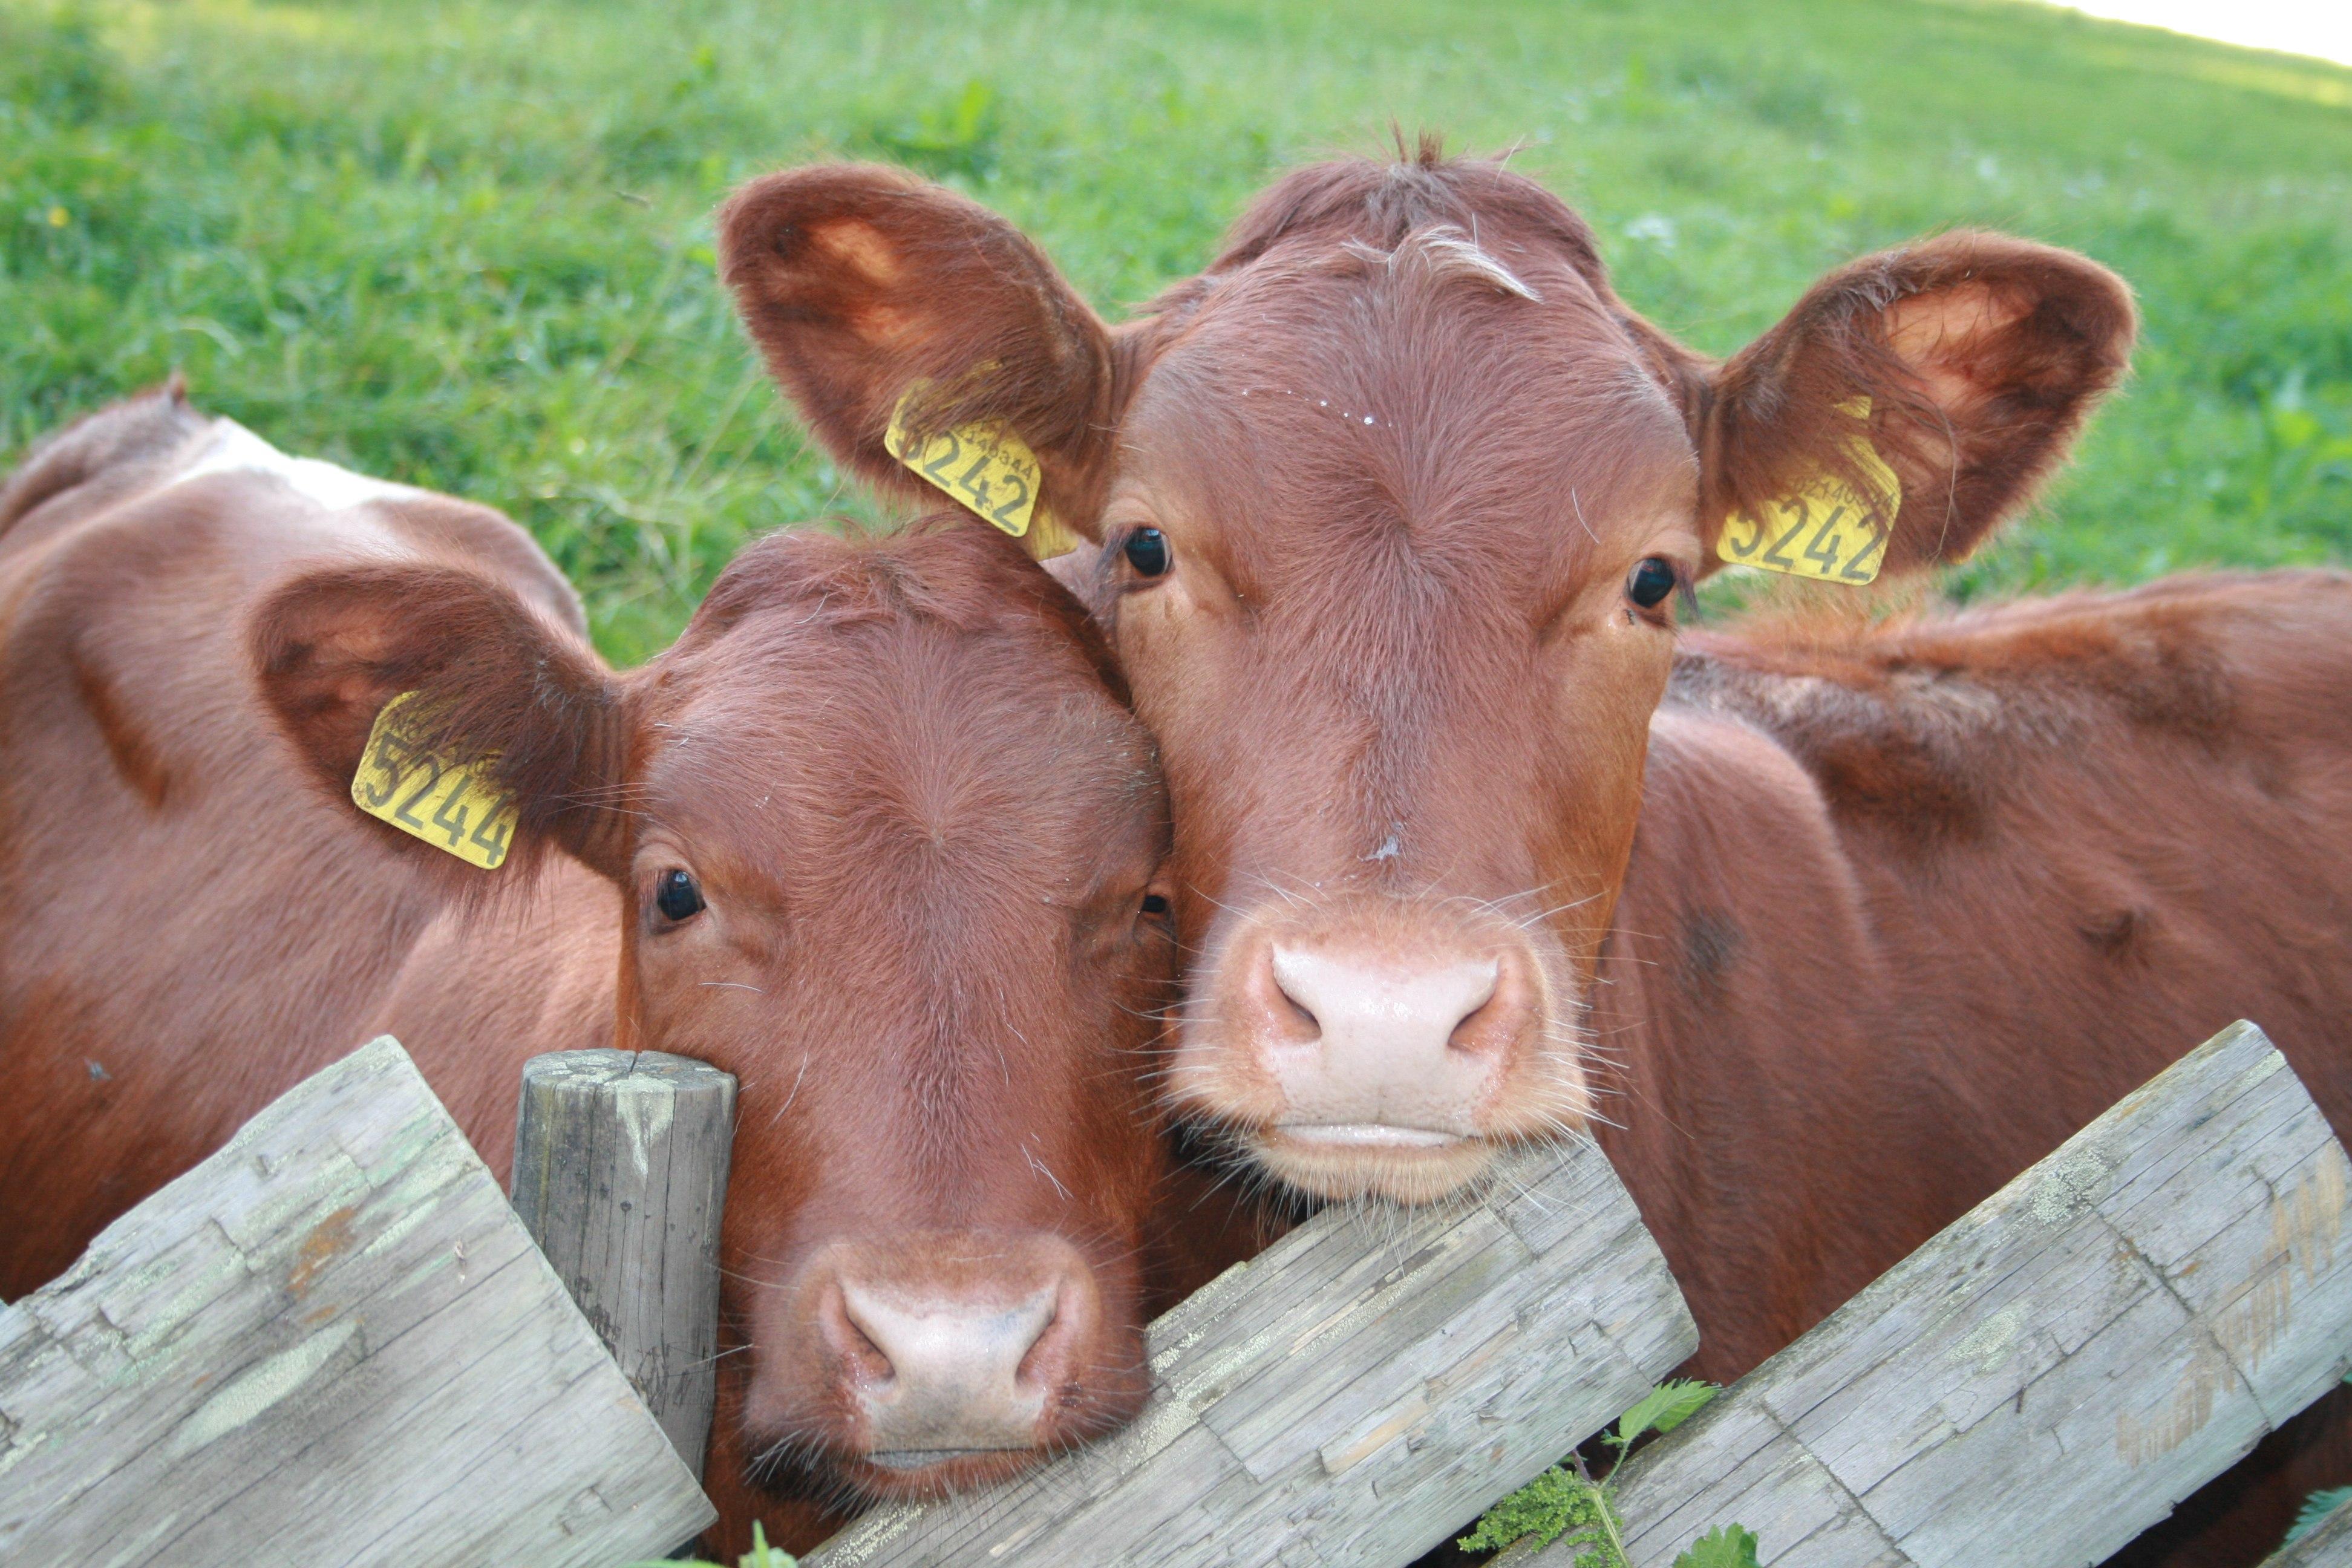 Cattle Farmer Salary and Job Description Interviews Career Options